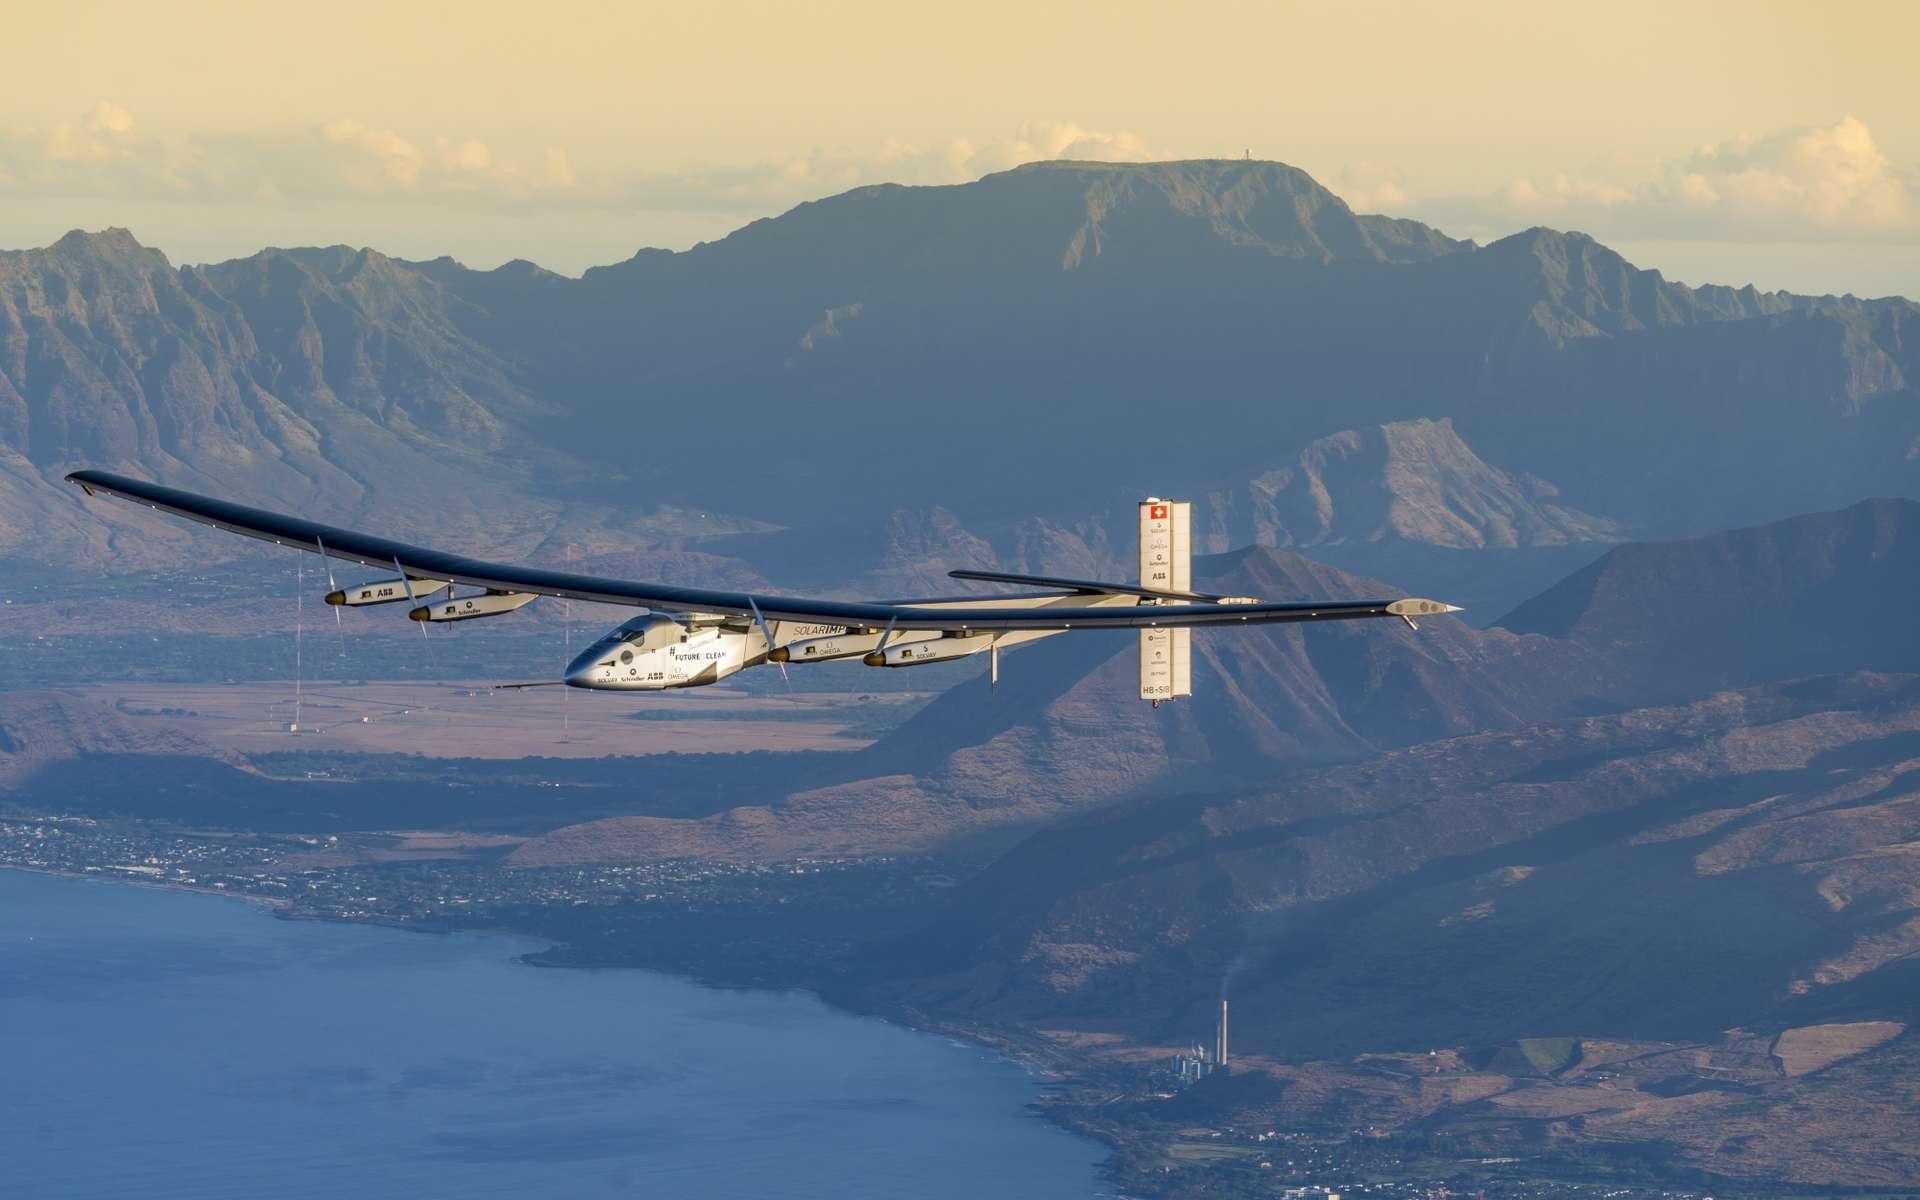 L'avion solaire SI2 en vol au-dessus d'Hawaï le 27 mars 2016, pour un vol d'essai. © Solar Impulse, Revillard